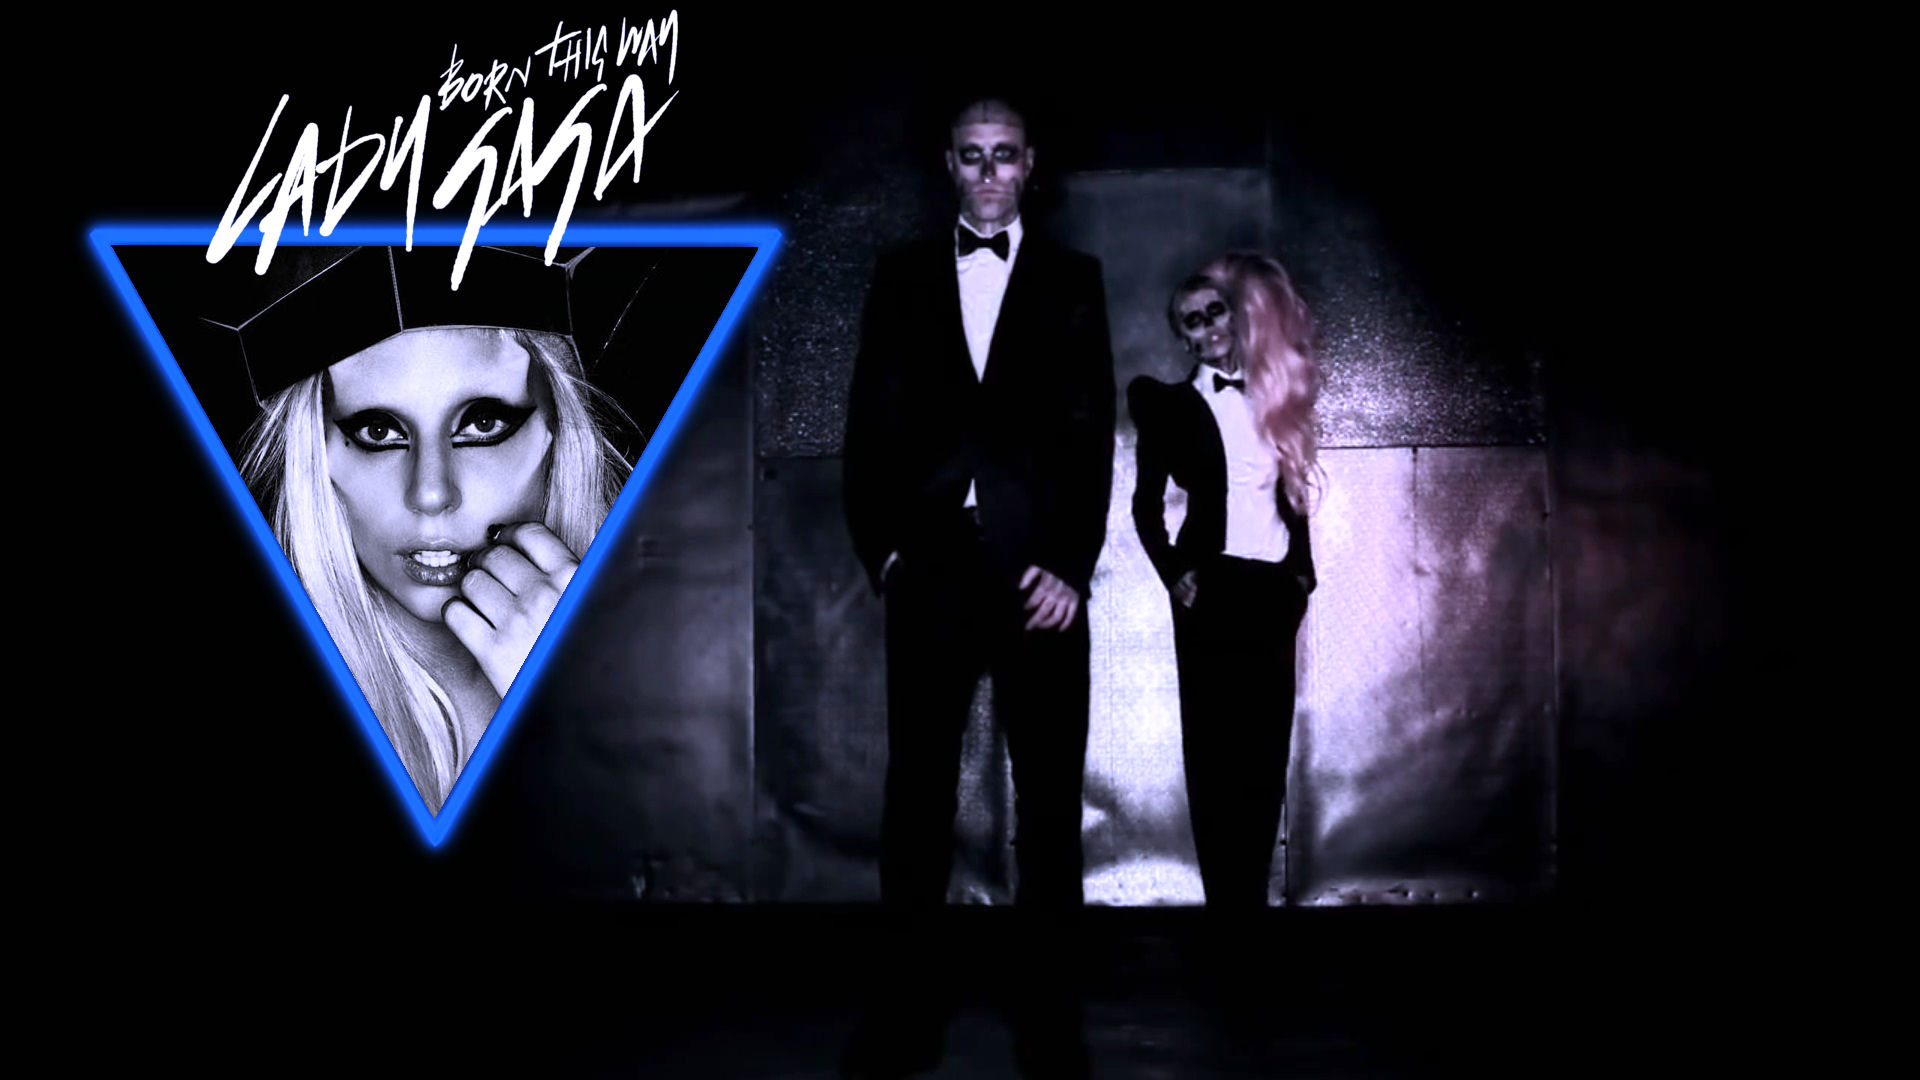 Lady GaGa Born This Way - lady gaga fondo de pantalla